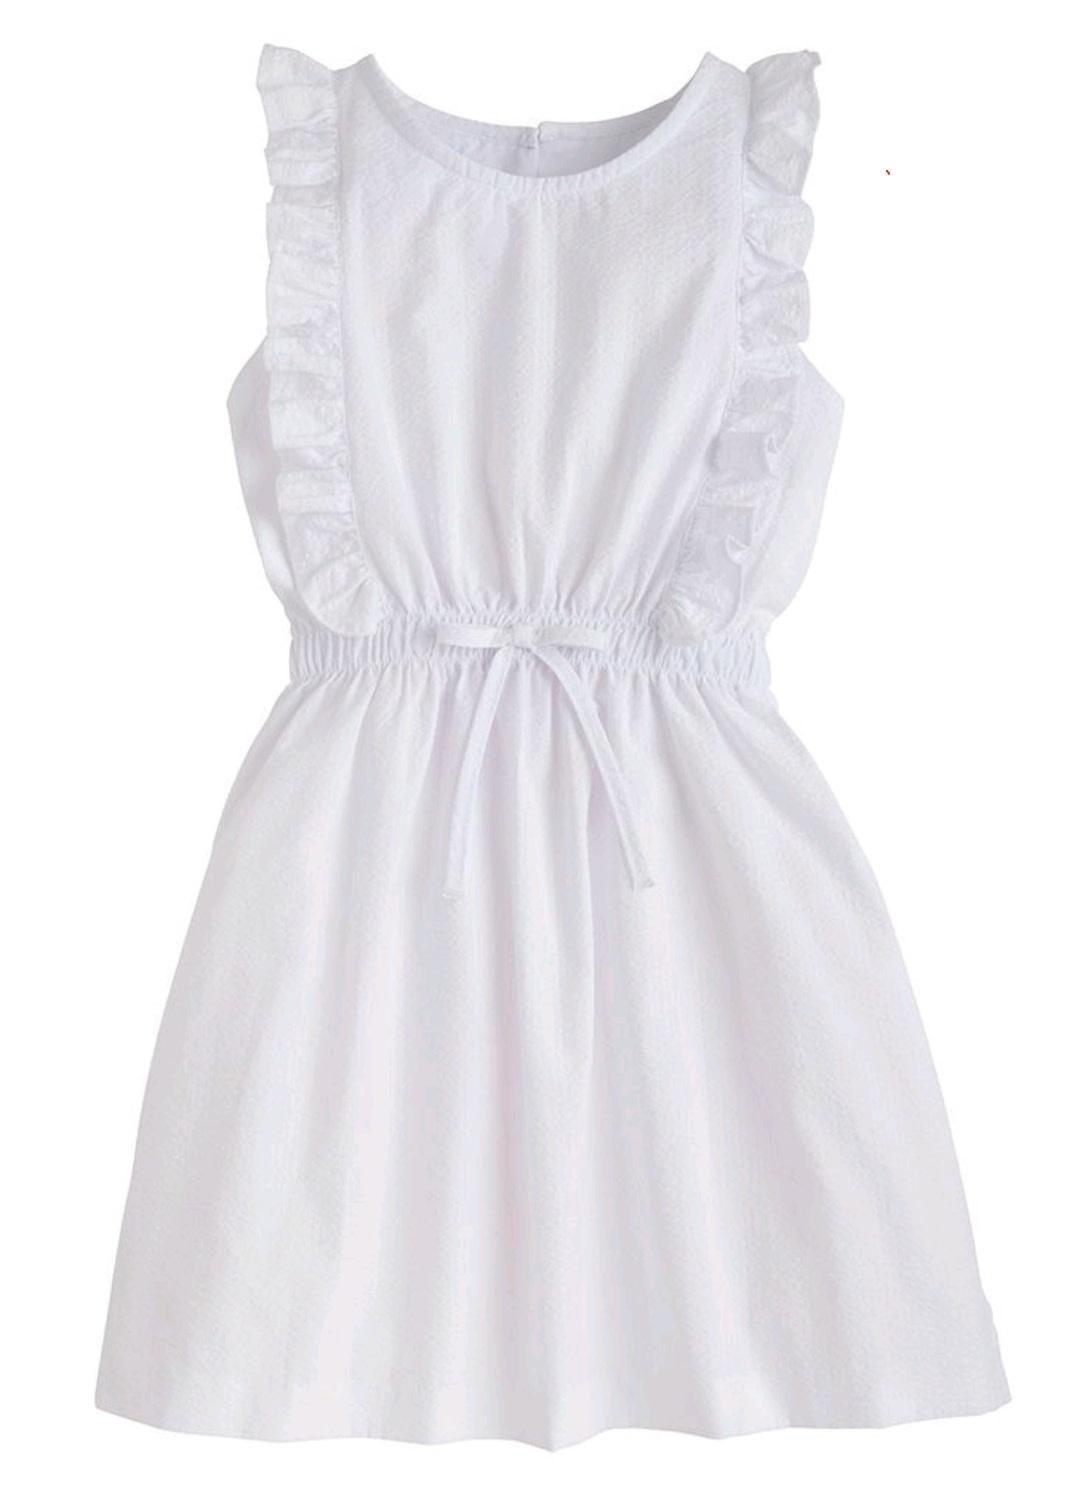 Little English White Seersucker Louise Dress